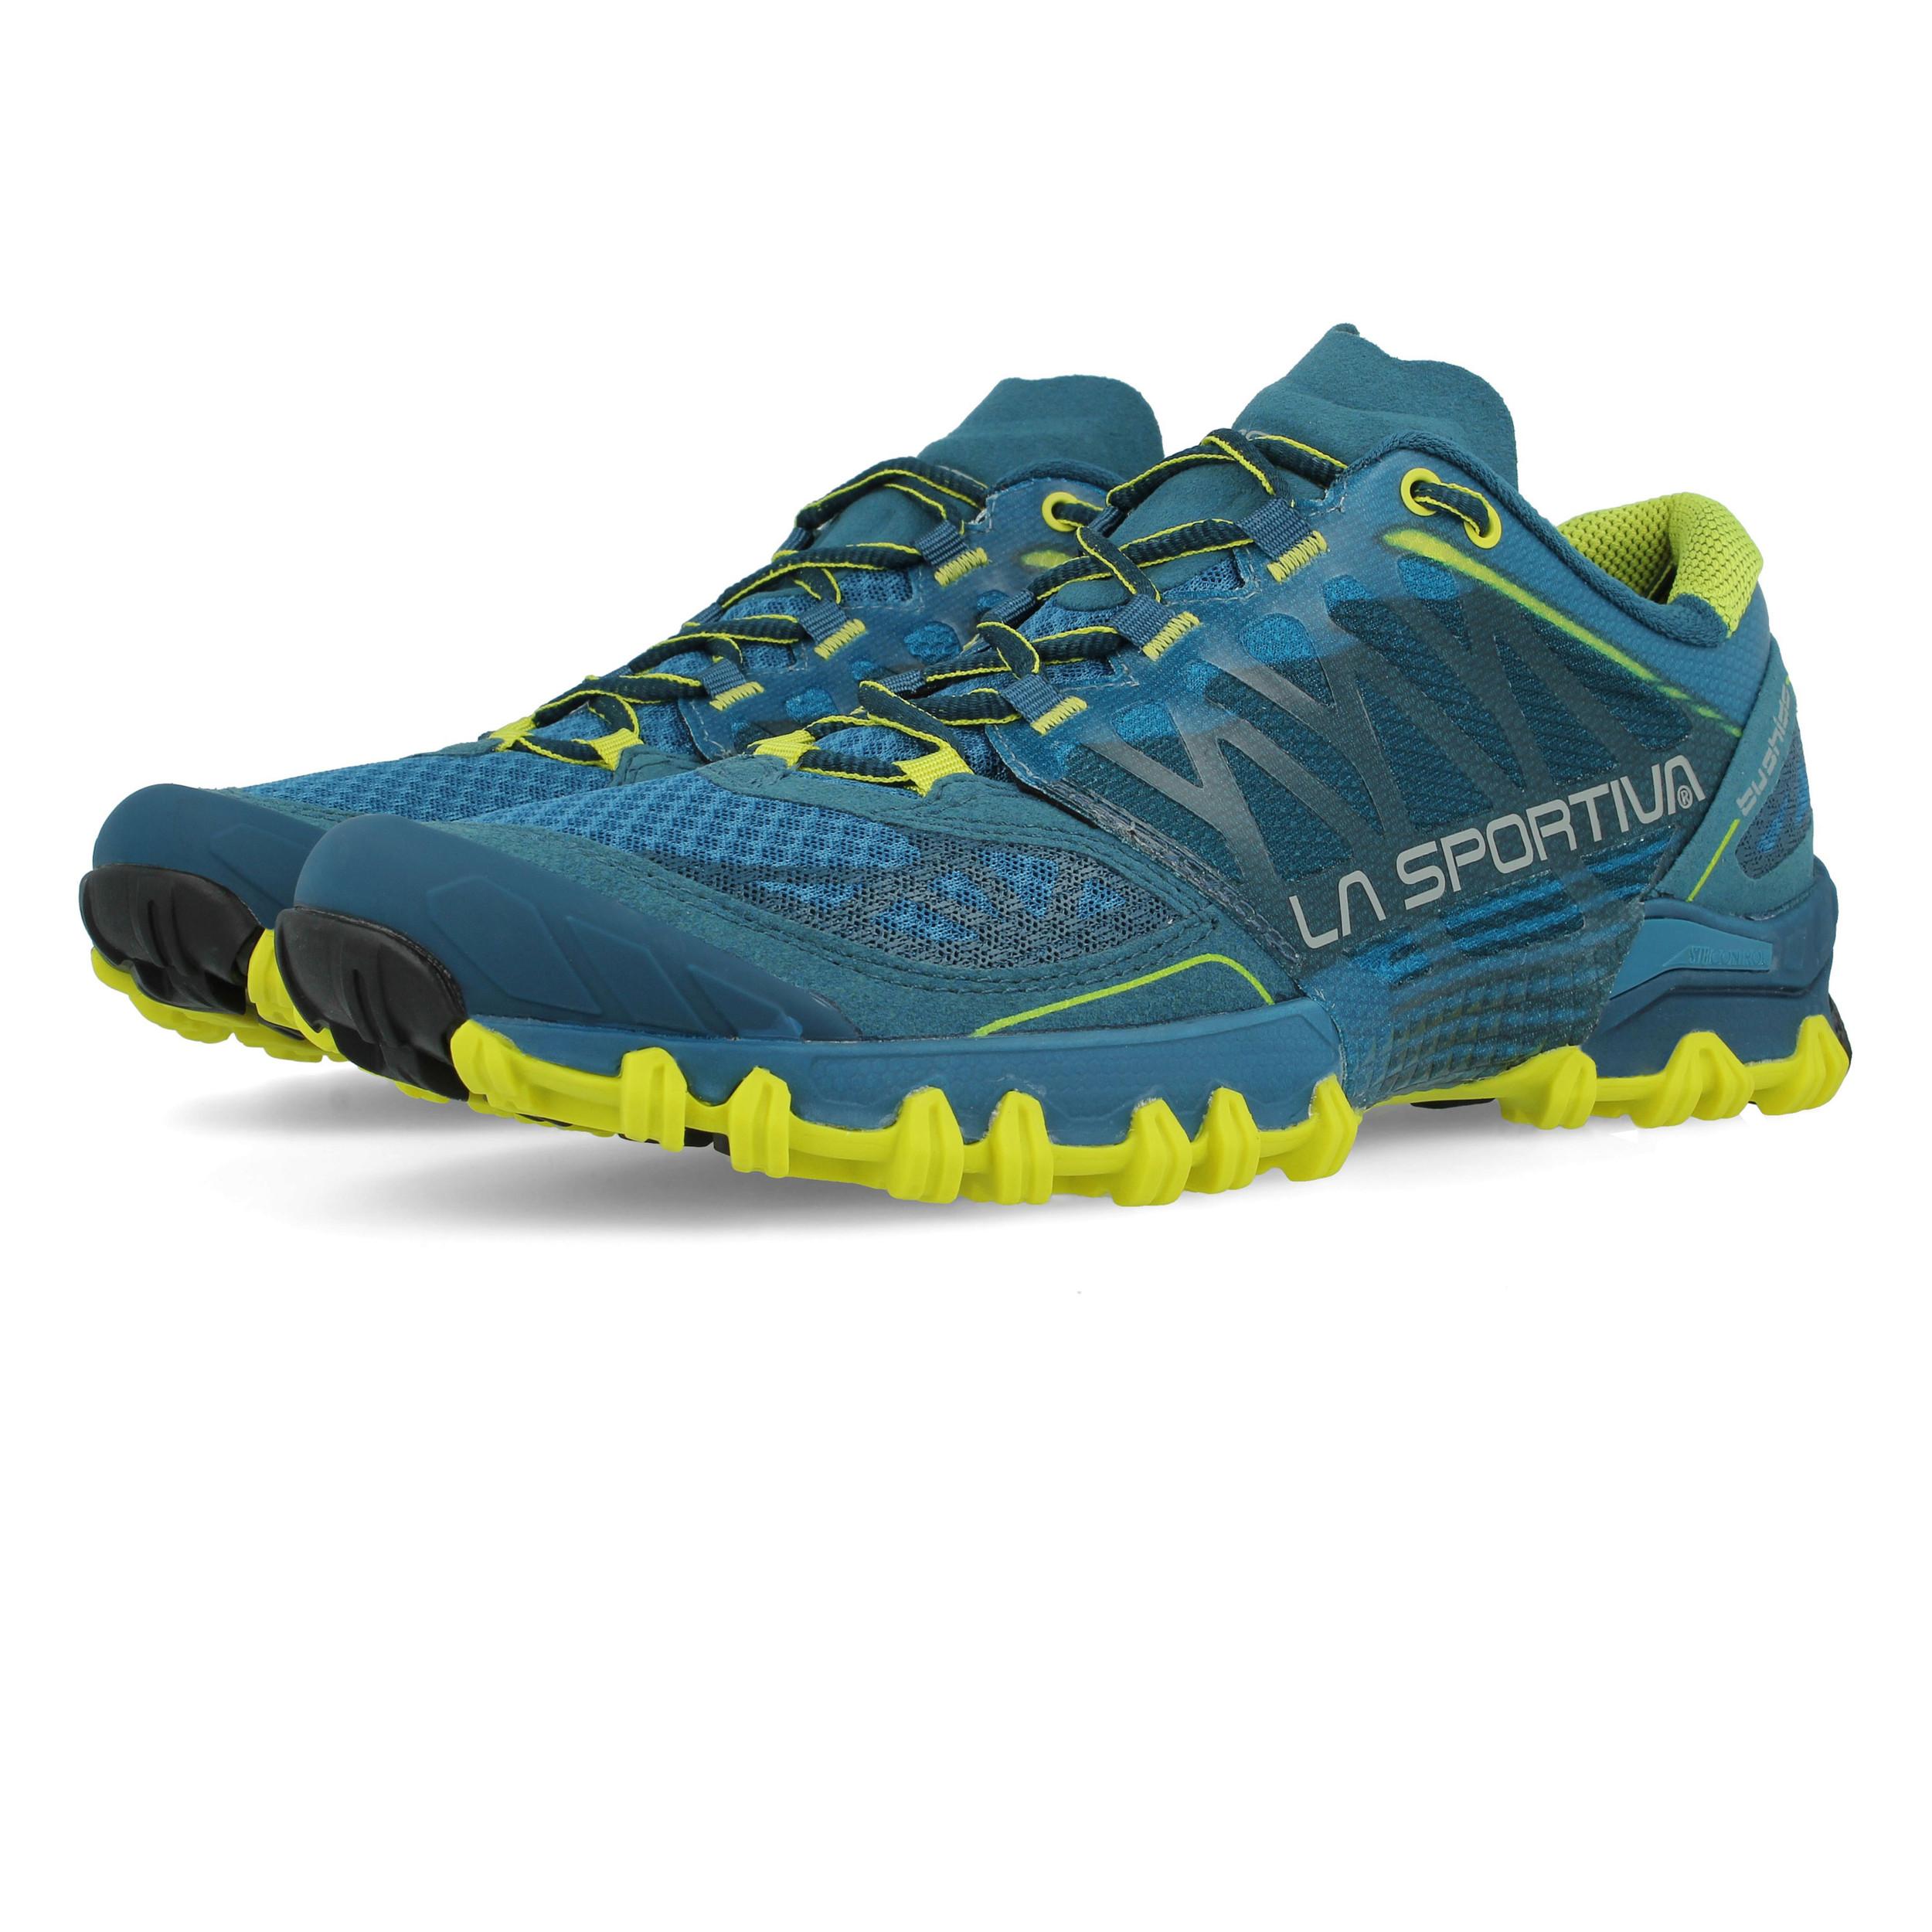 La Sportiva Herren Blau Bushido Trail Jogging Schuhe Laufschuhe Sportschuhe